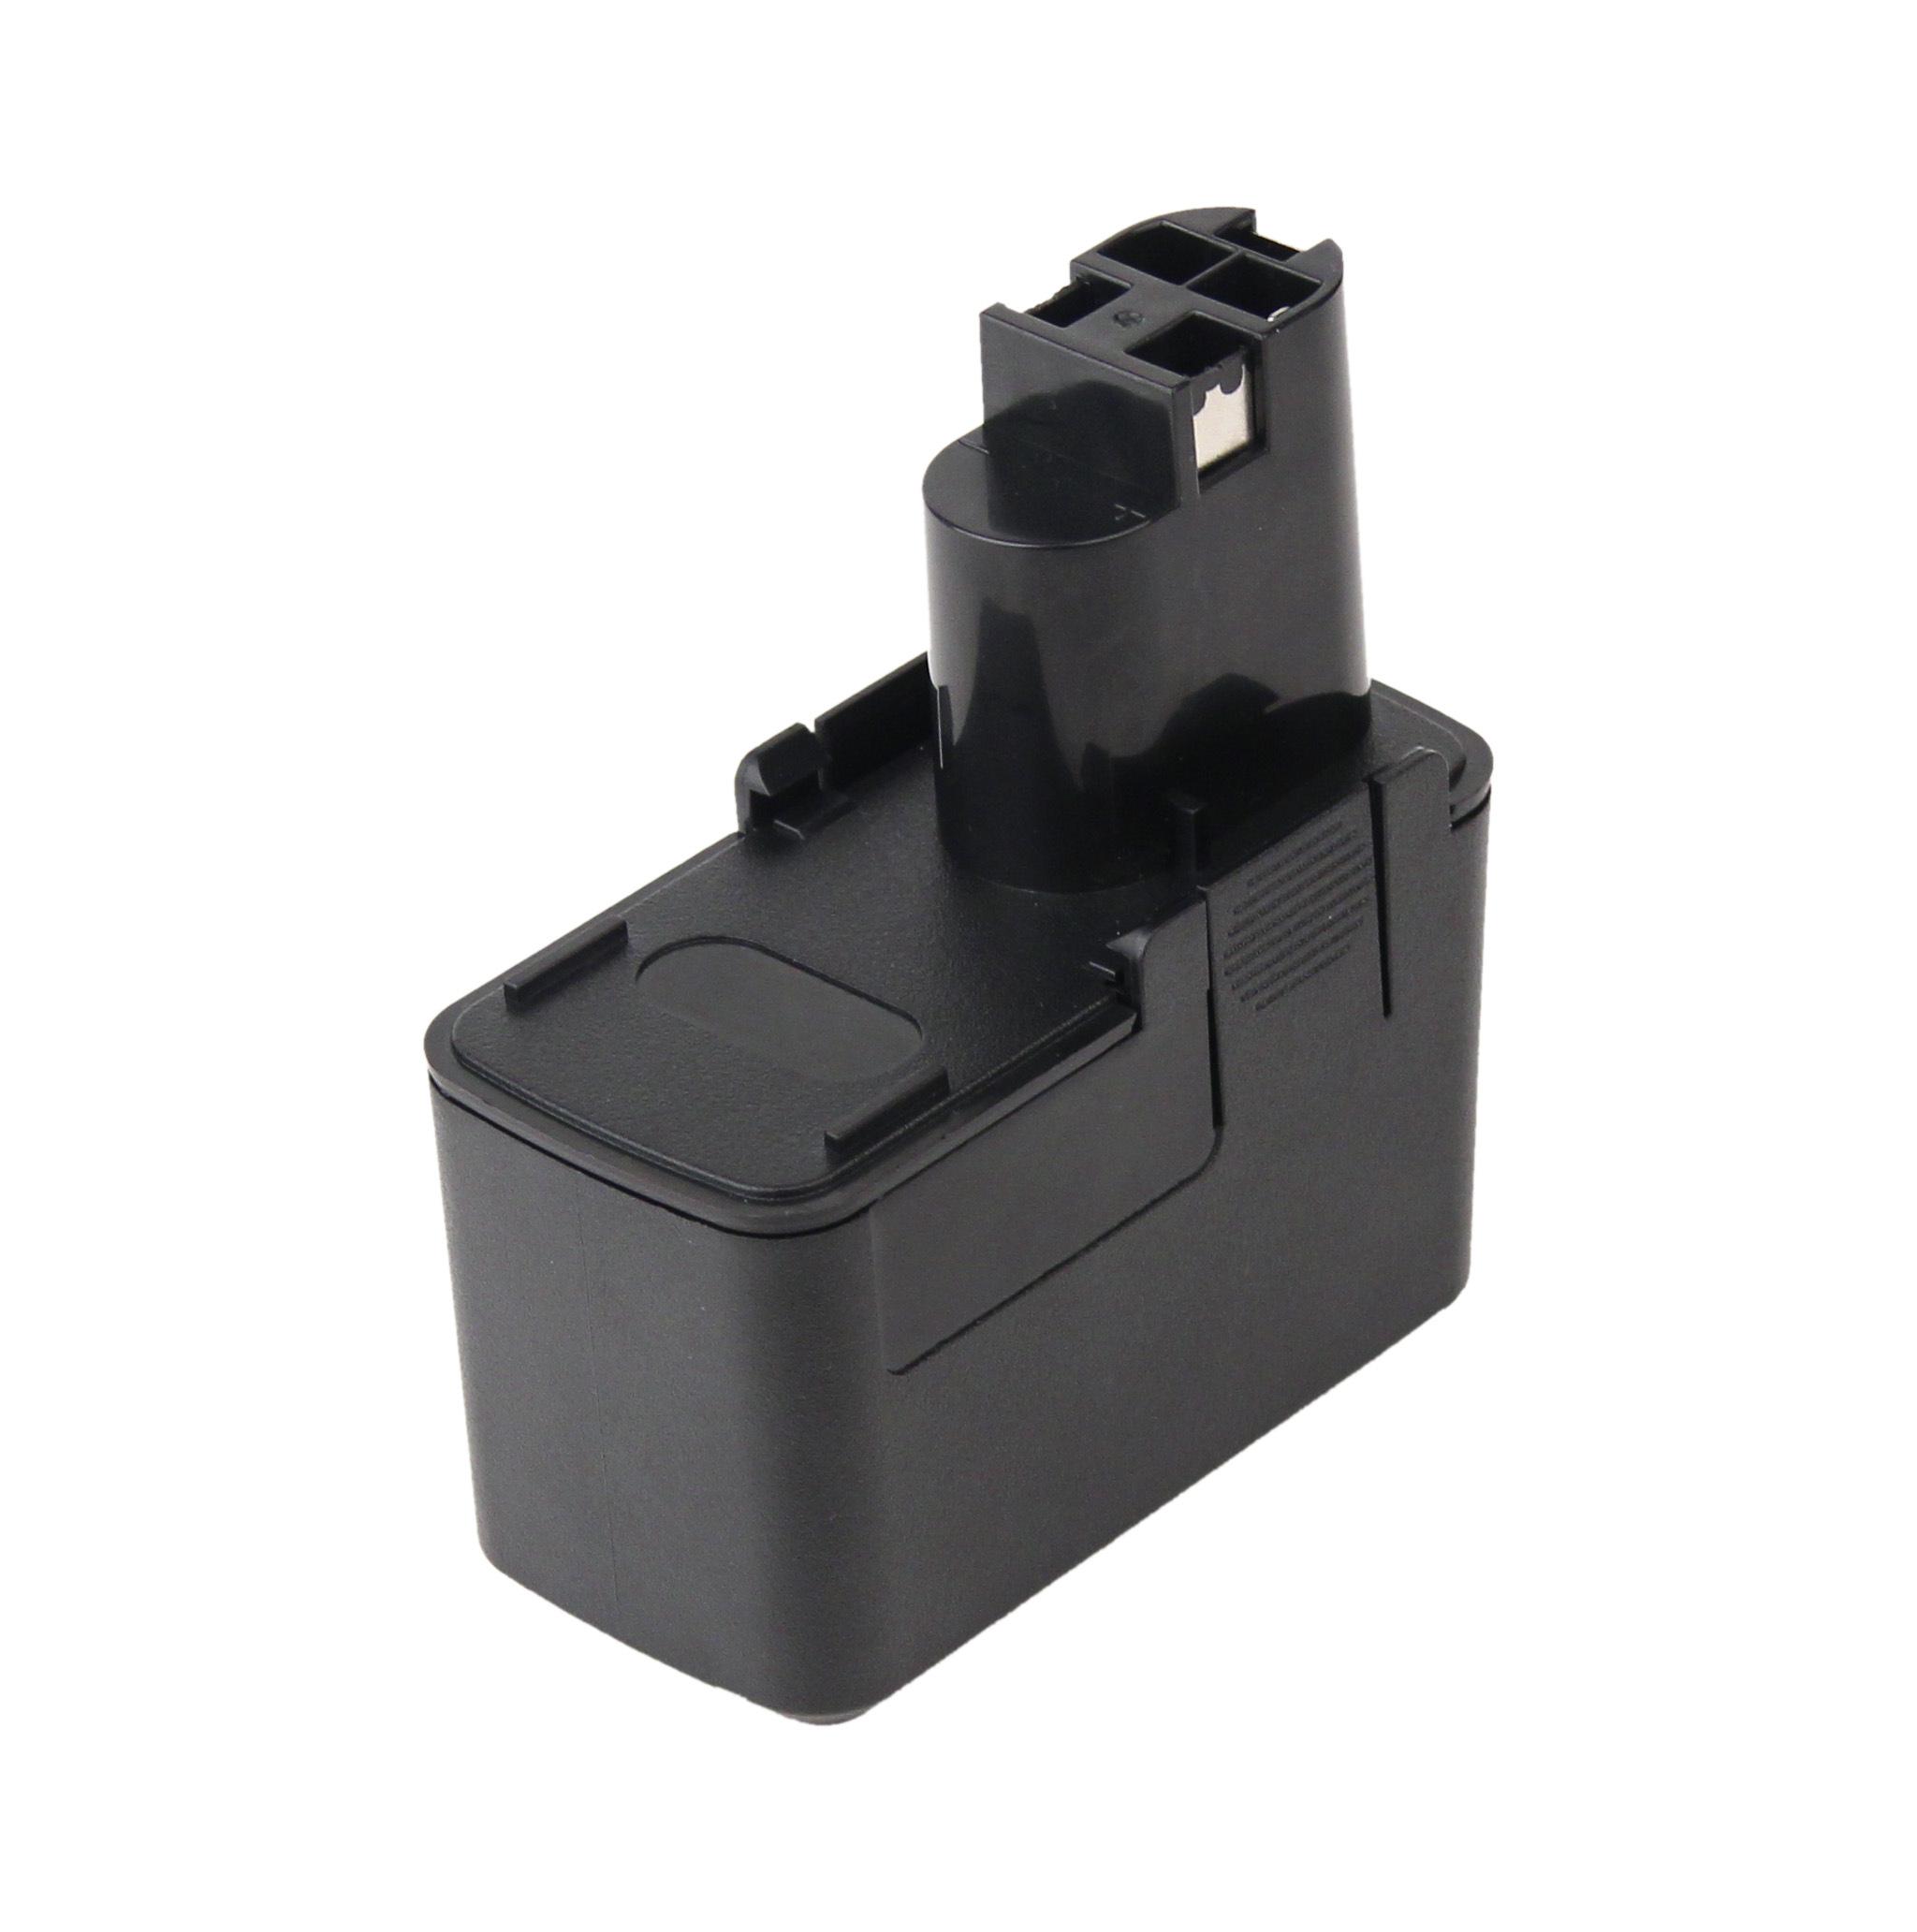 Power Tool Battery for Bosch 2 607 335 054